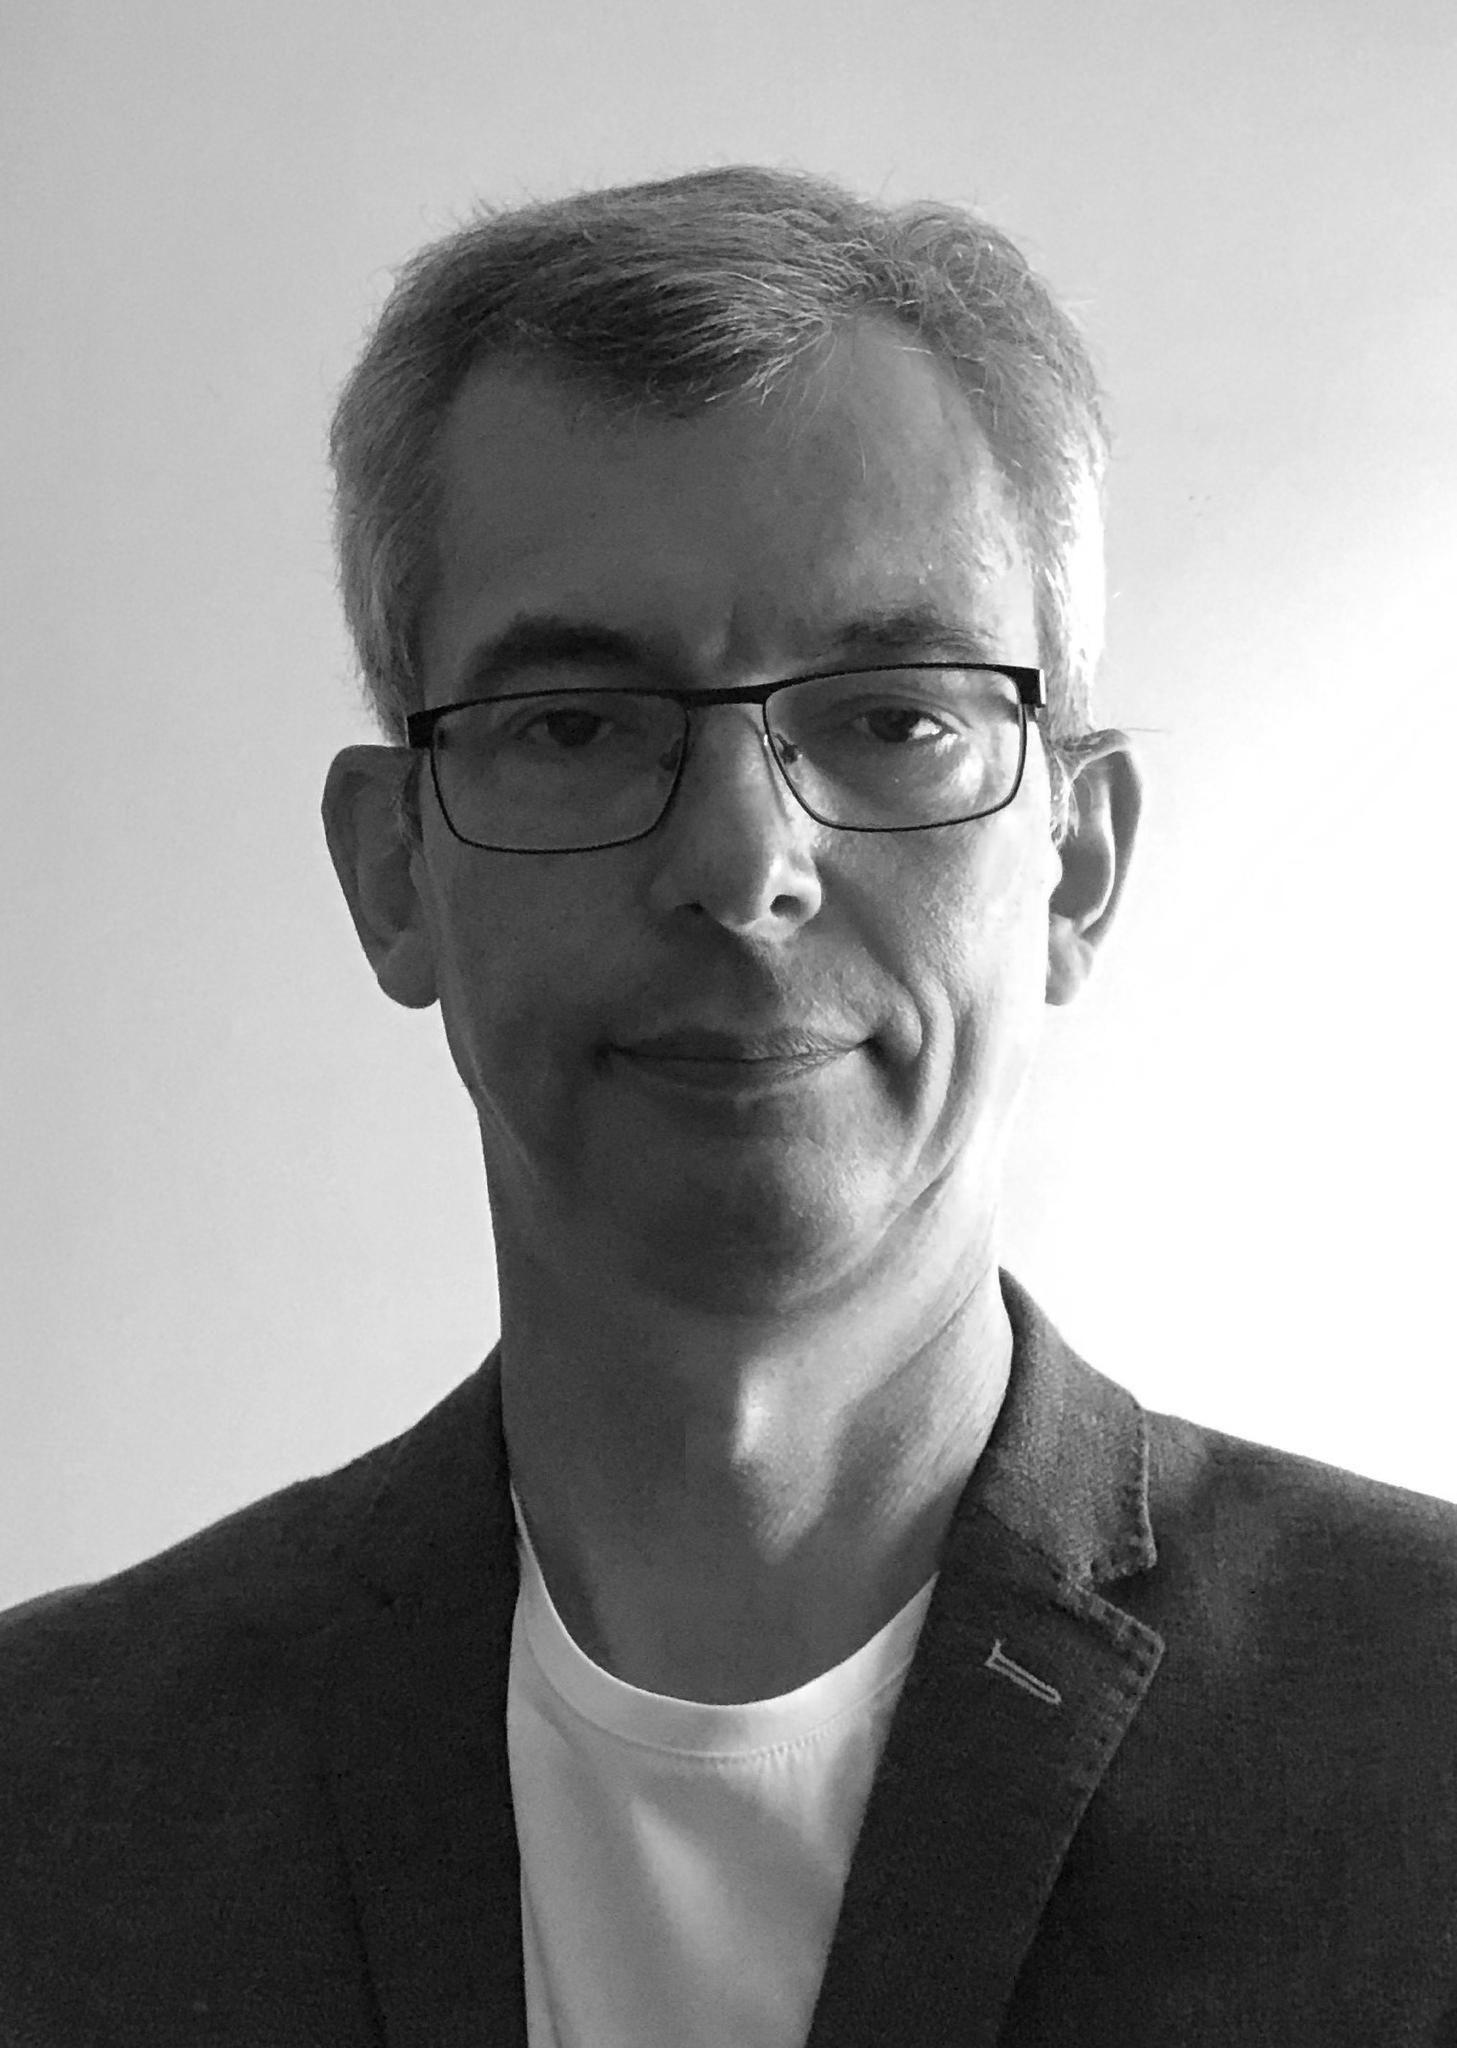 Serge Retkowsky